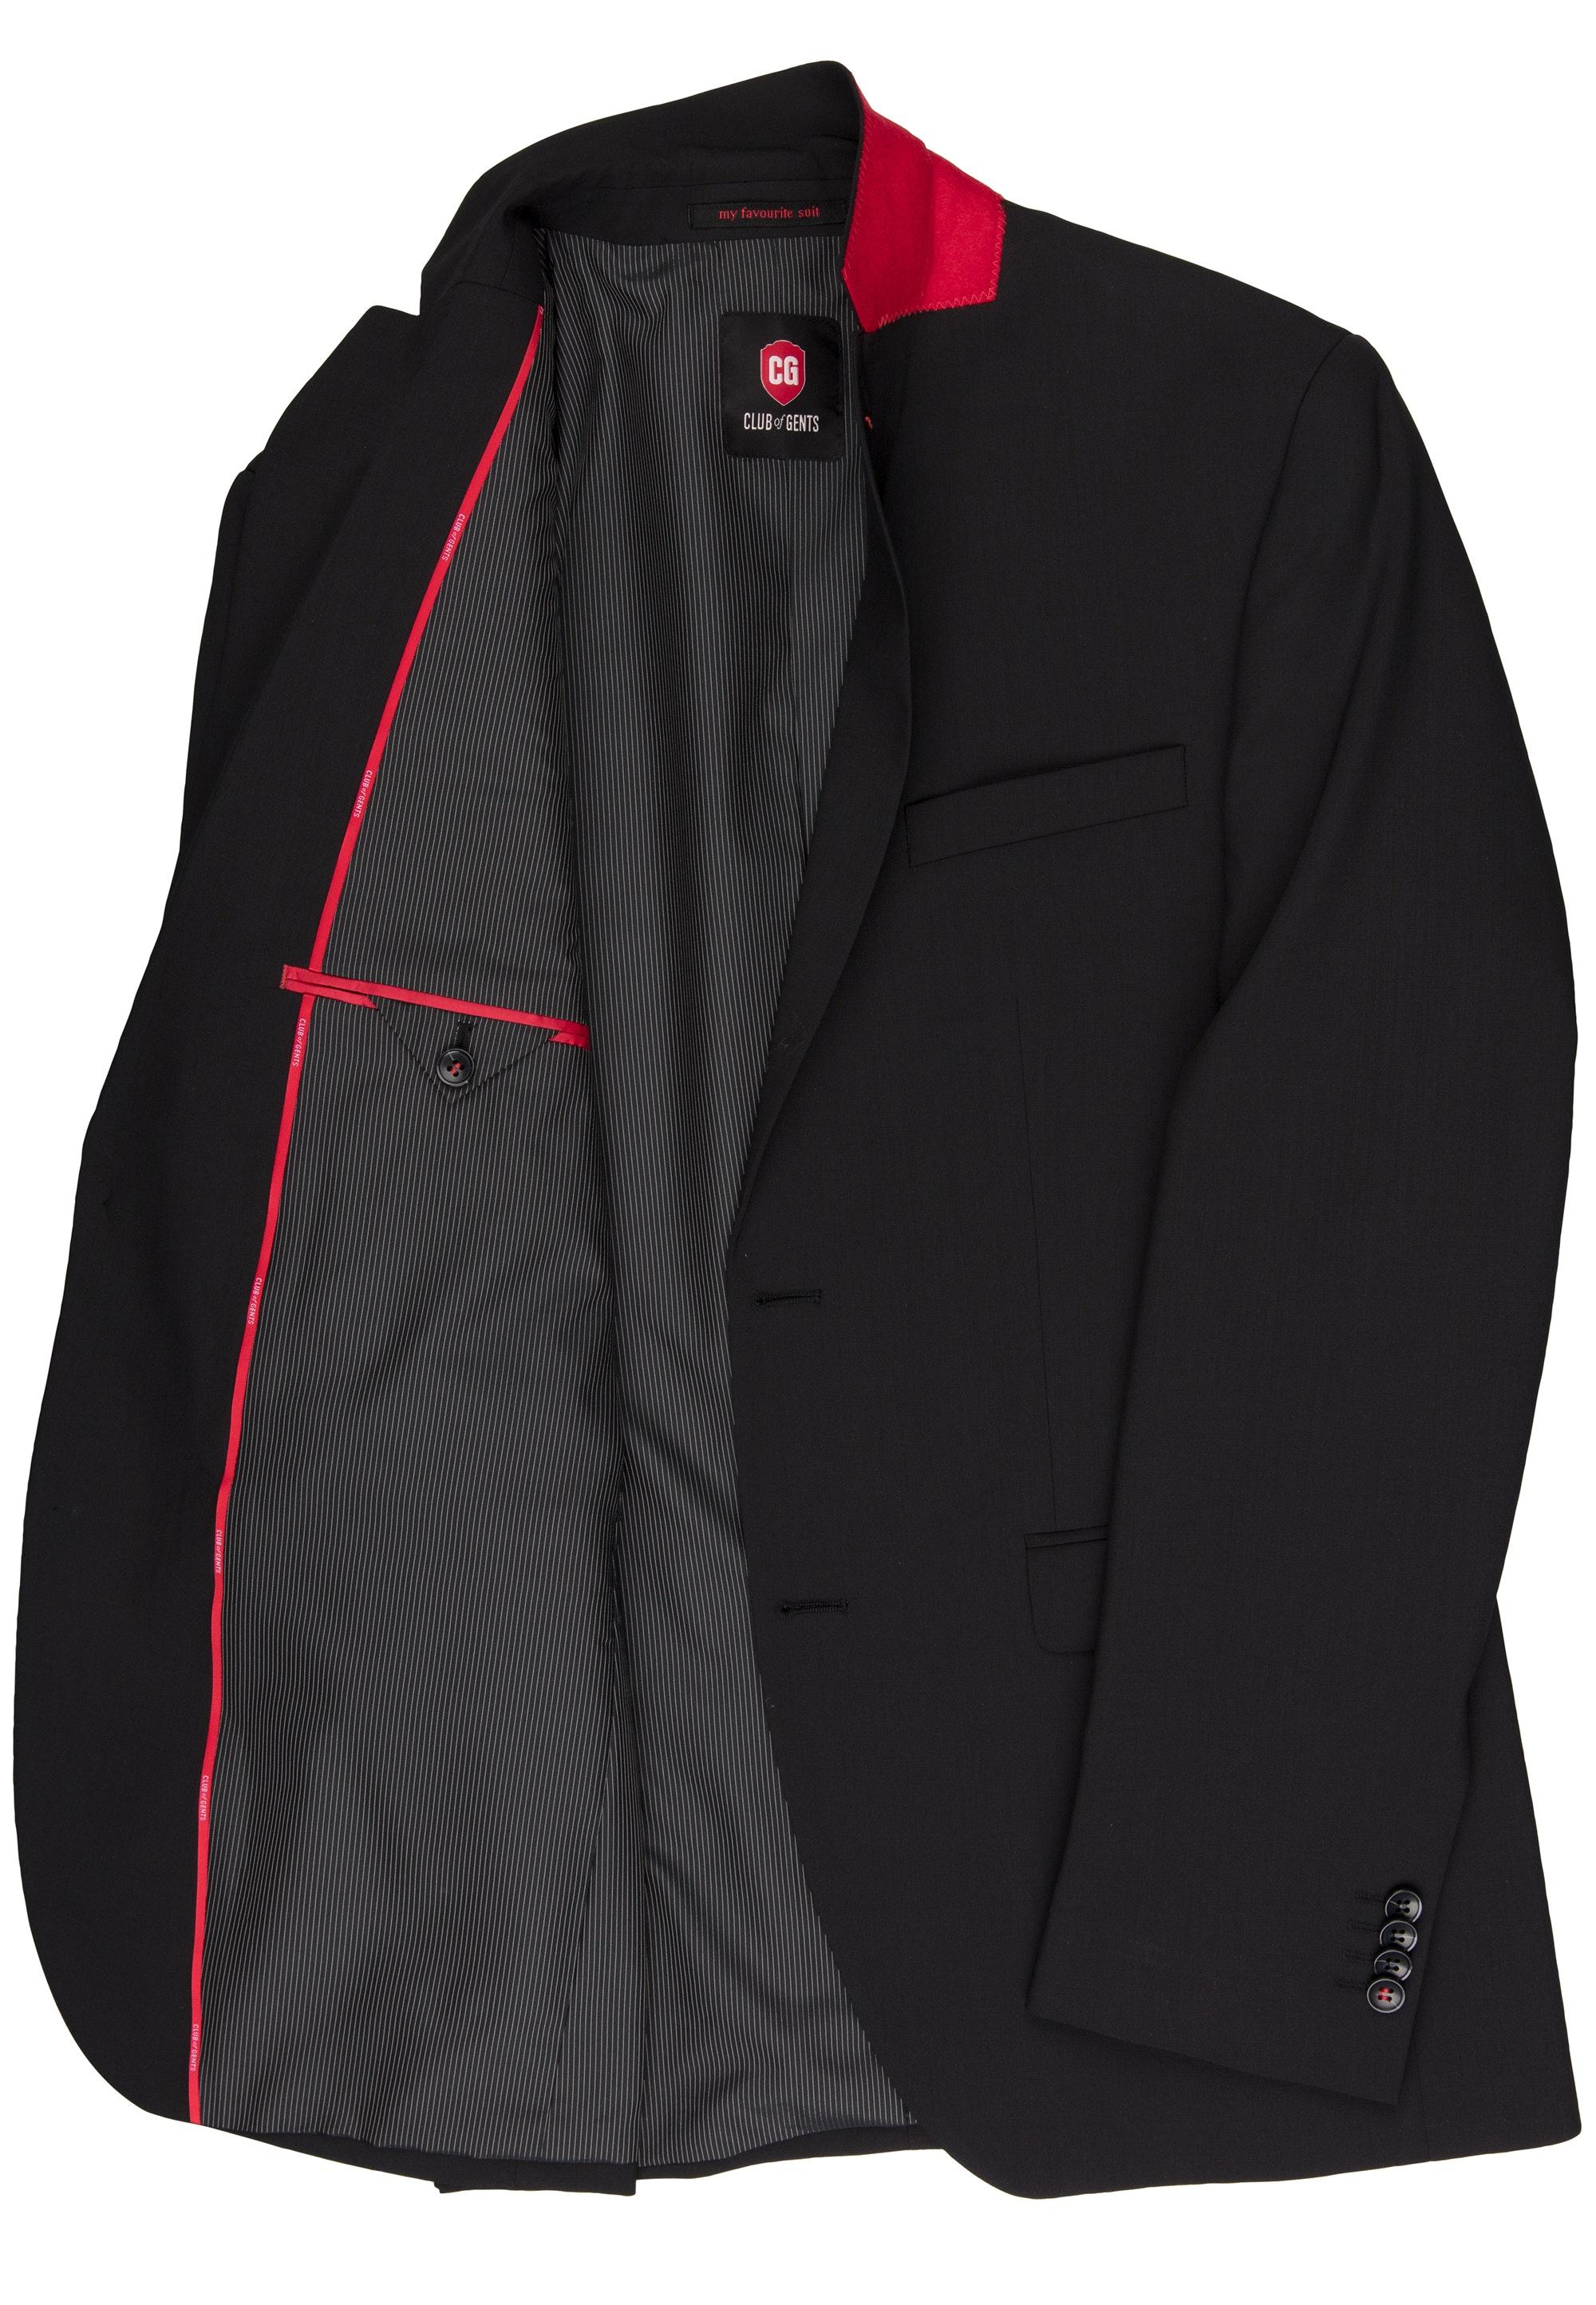 CG Club of Gents Jacket Sakko Andy